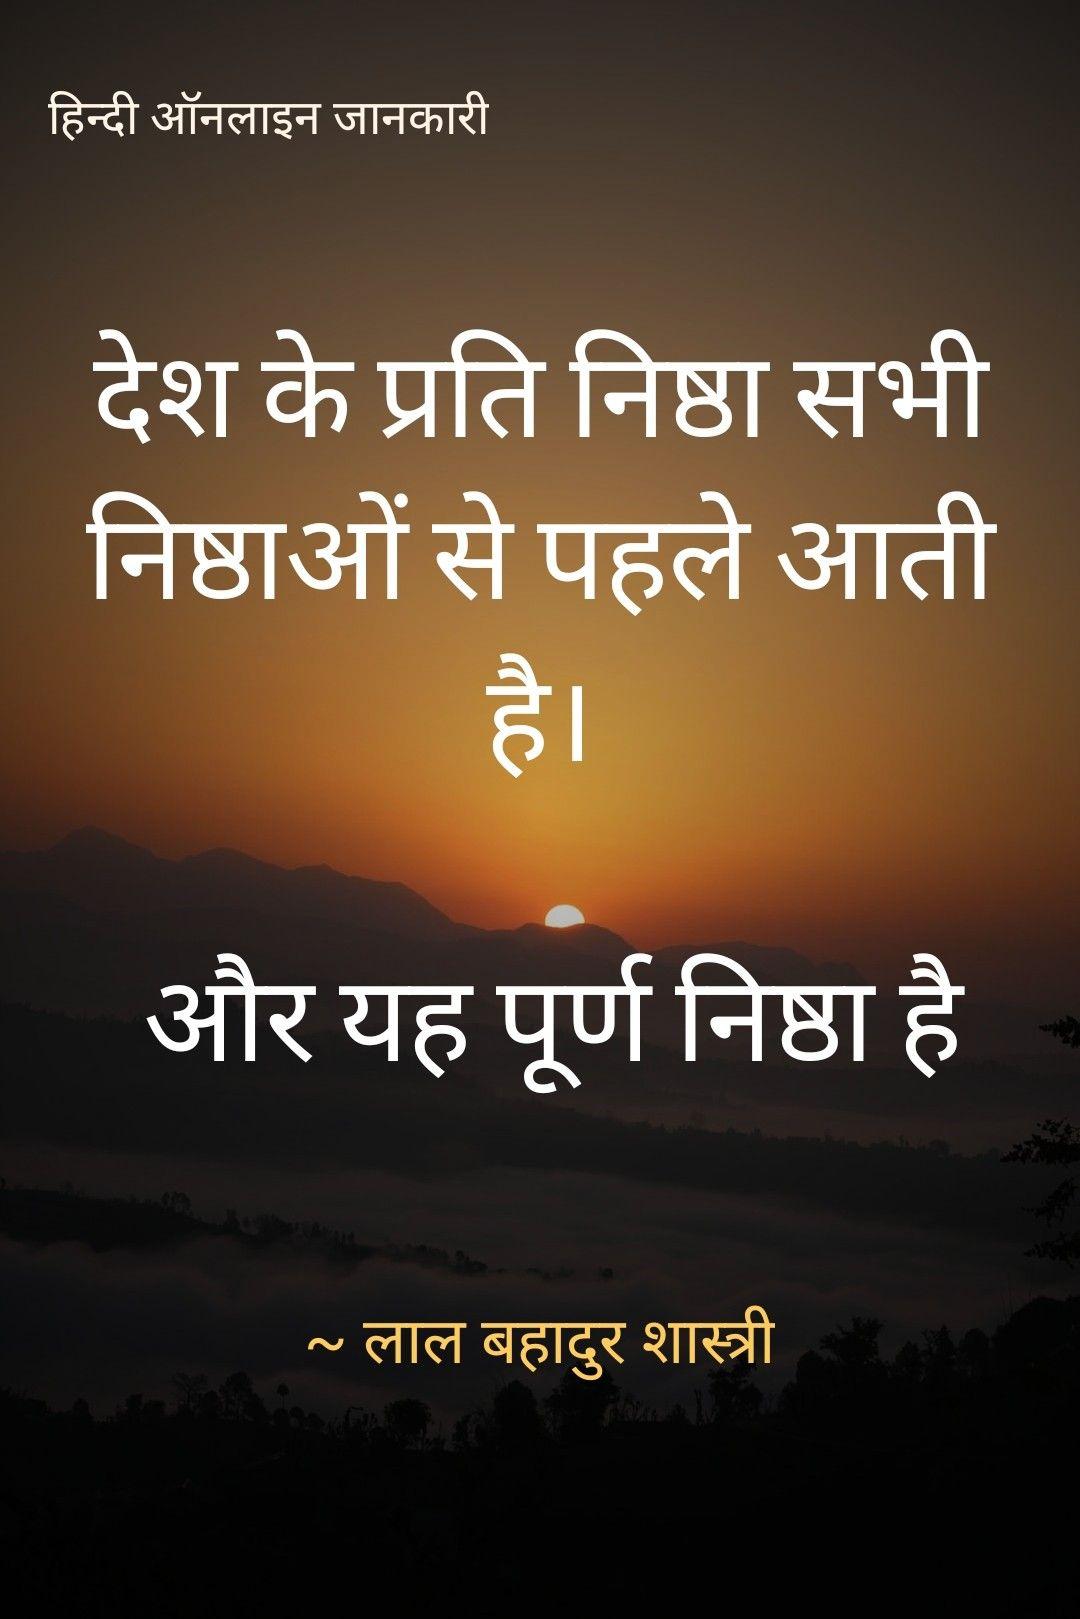 Pin on Lal Bahadur Shastri